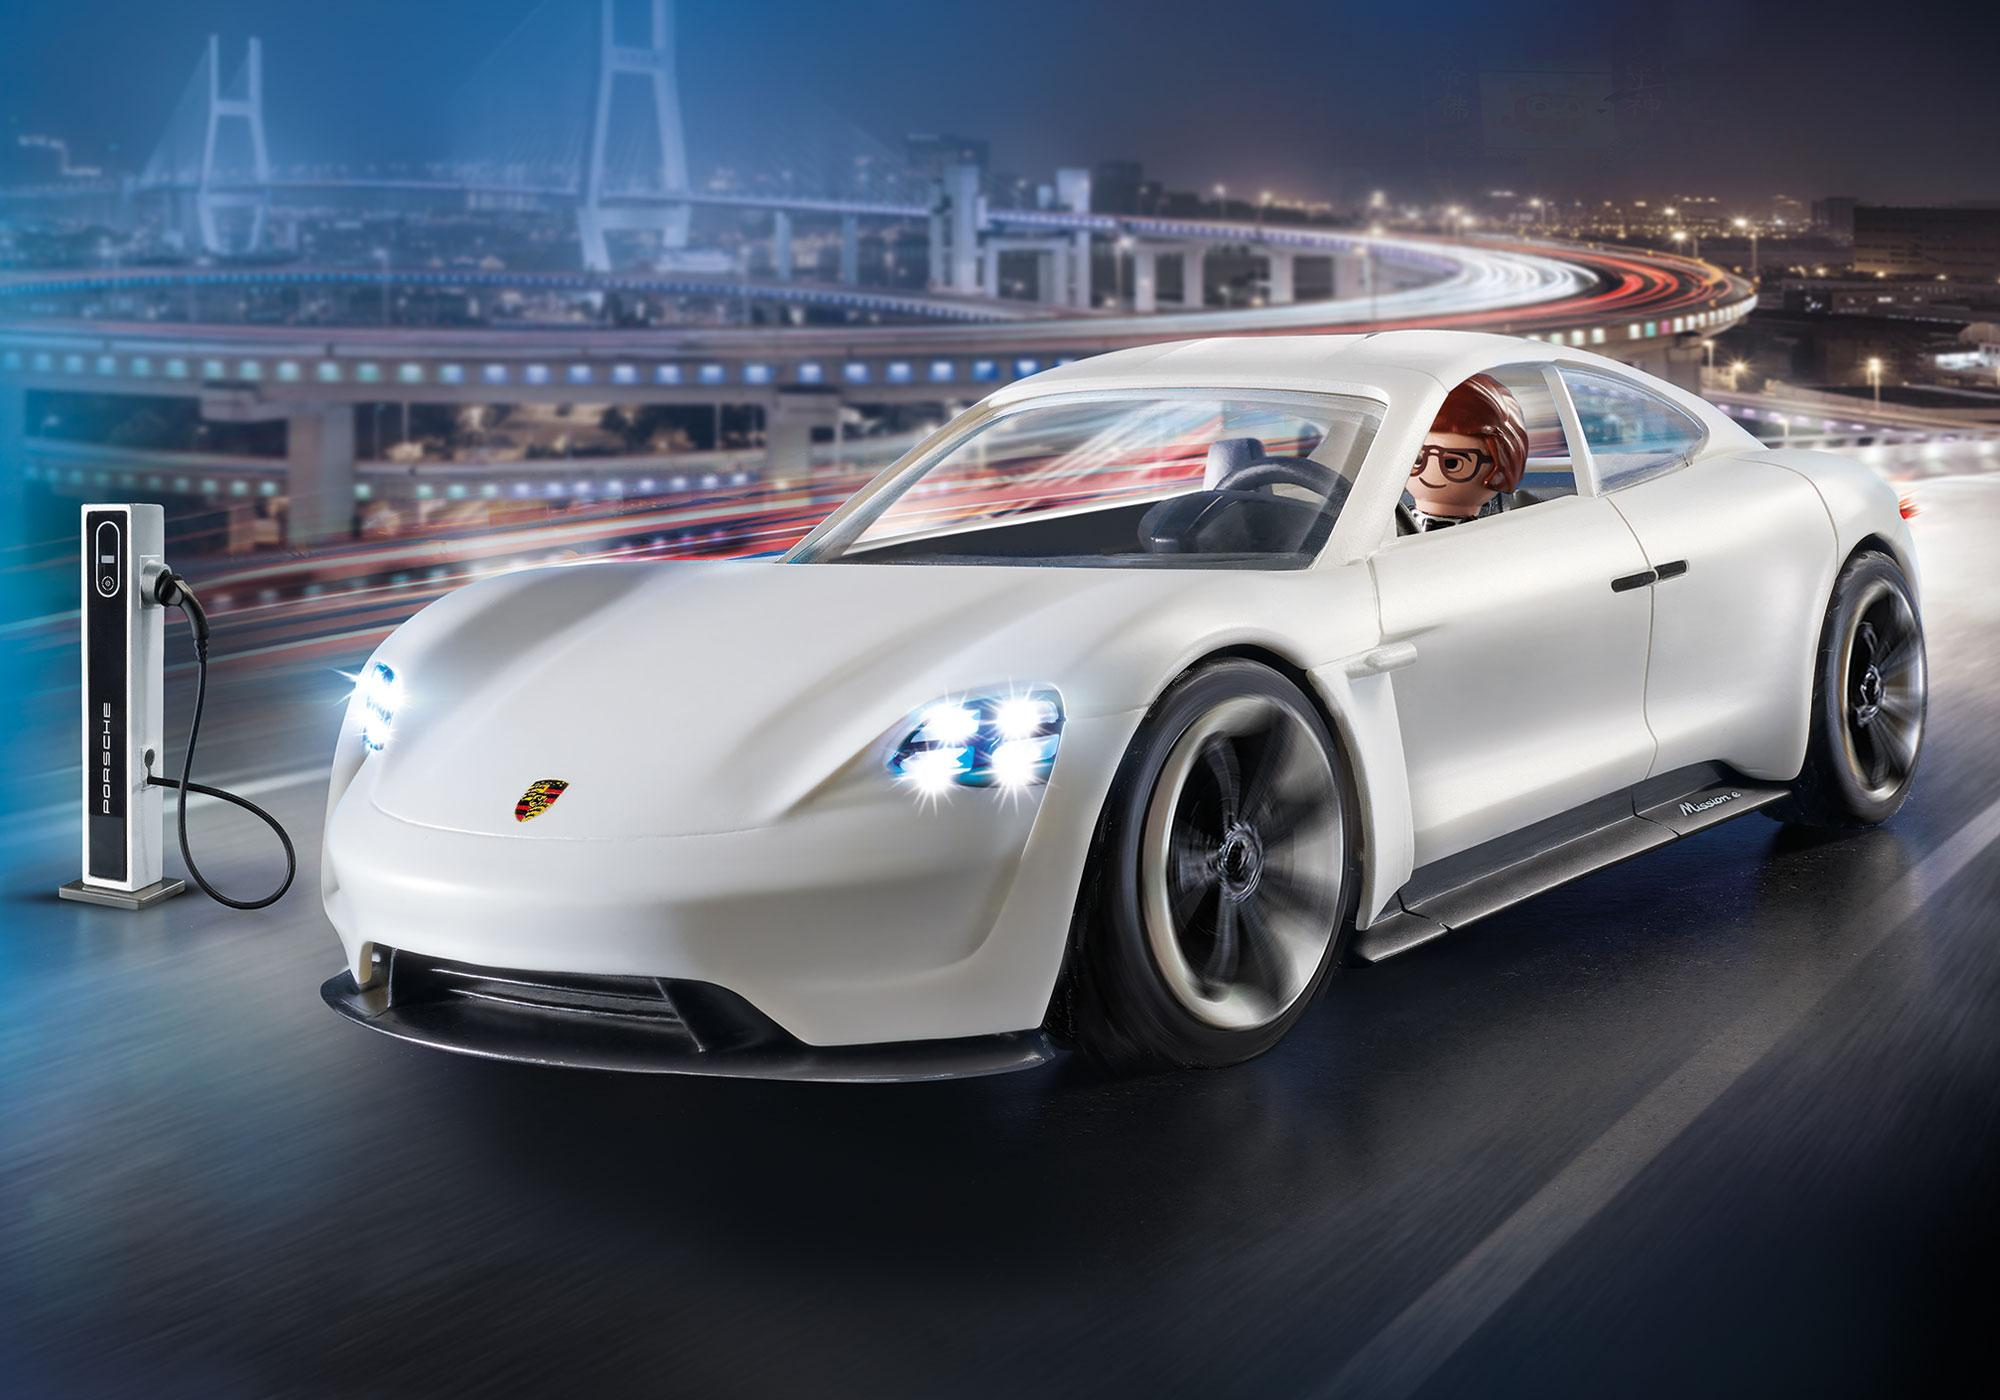 http://media.playmobil.com/i/playmobil/70078_product_detail/PLAYMOBIL: THE MOVIE Rex Dasher et  Porsche Mission E